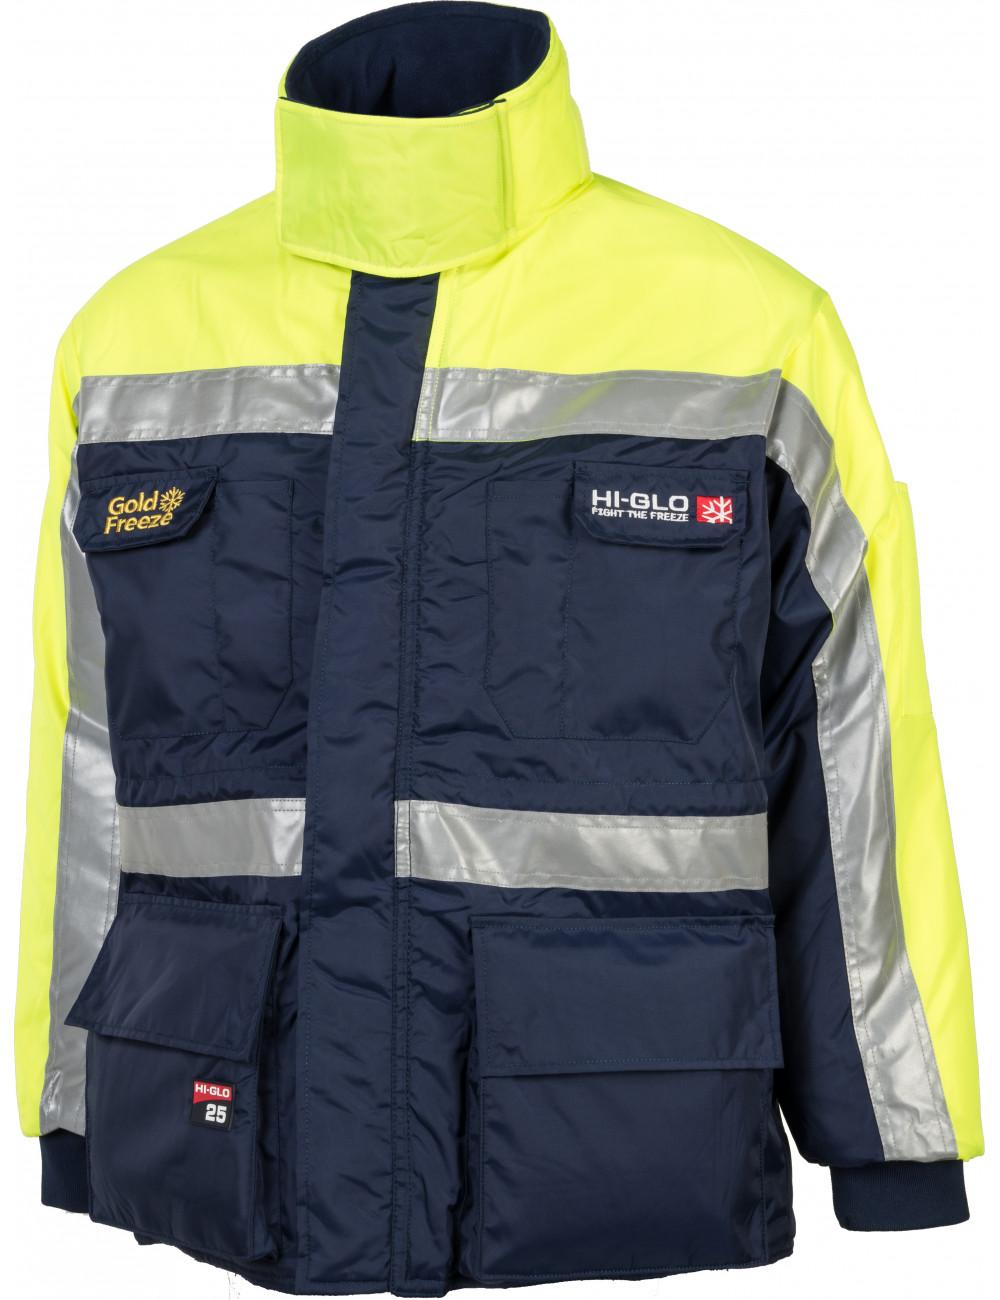 Jaket freezer reflektif dengan perlindungan hingga -64,2 ° C